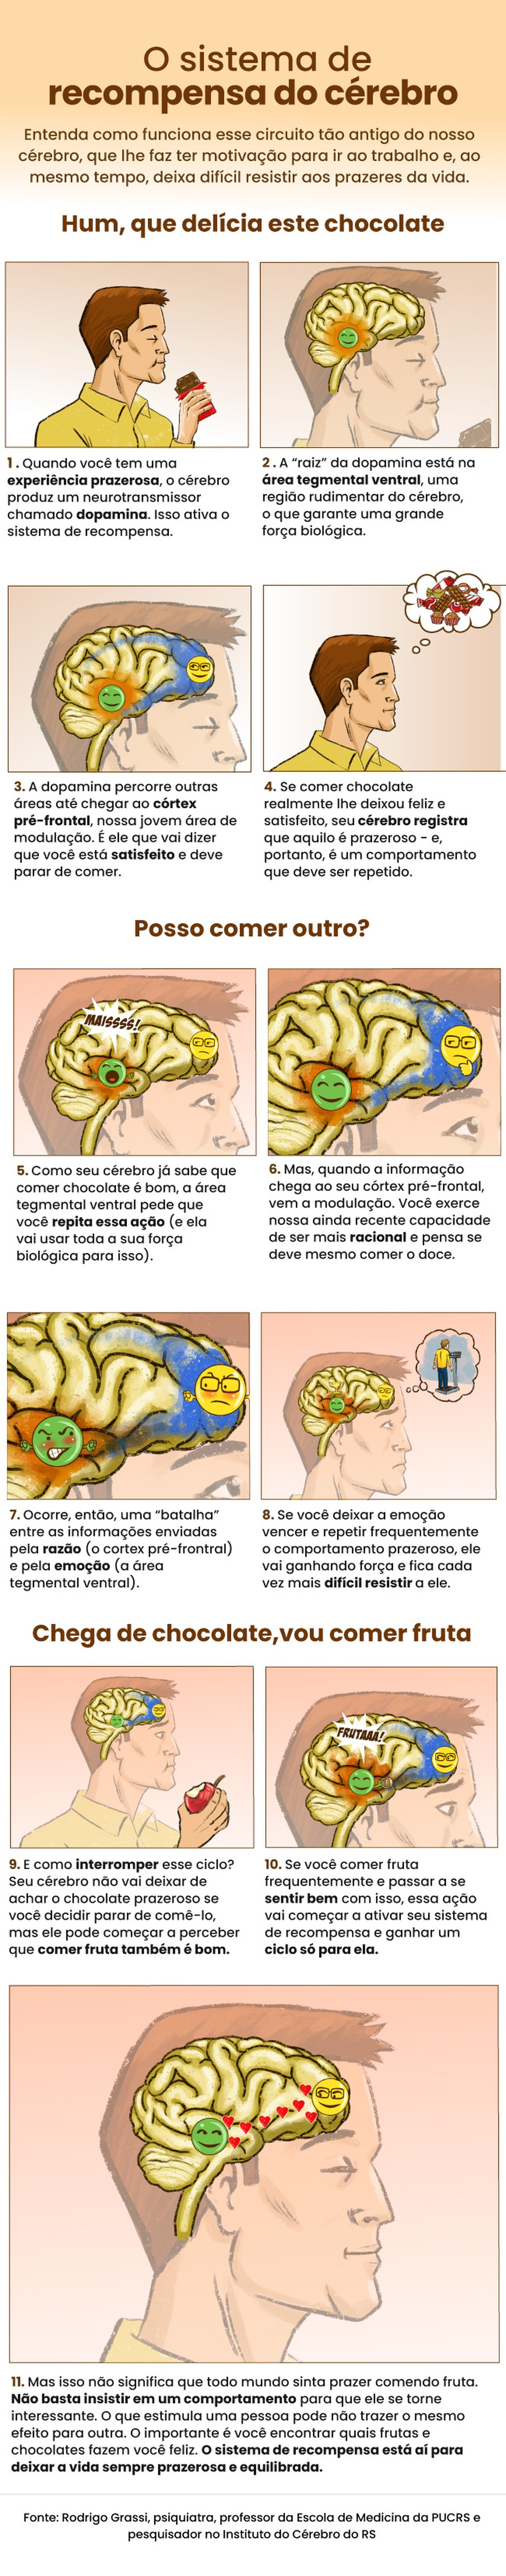 Infográfico mostra sistema de recompensa do cérebro — Foto: G1